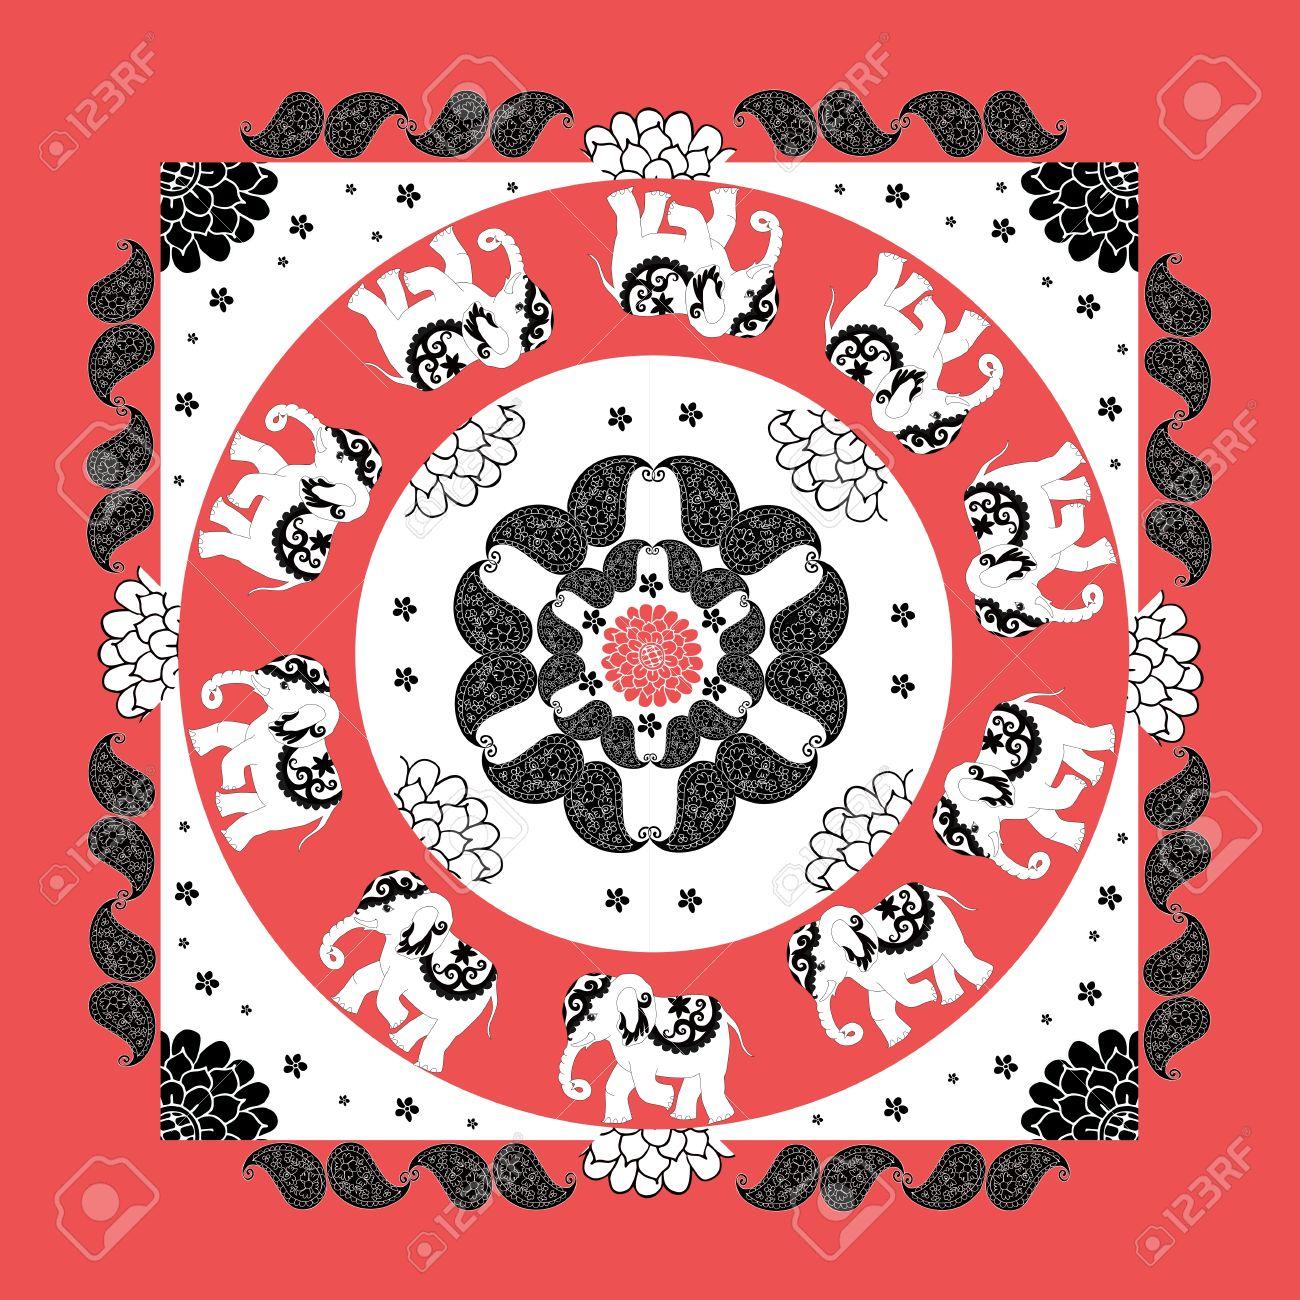 Mandala Original Indian Bandana Print With Ten Elephants And Paisley Silk Neck Scarf